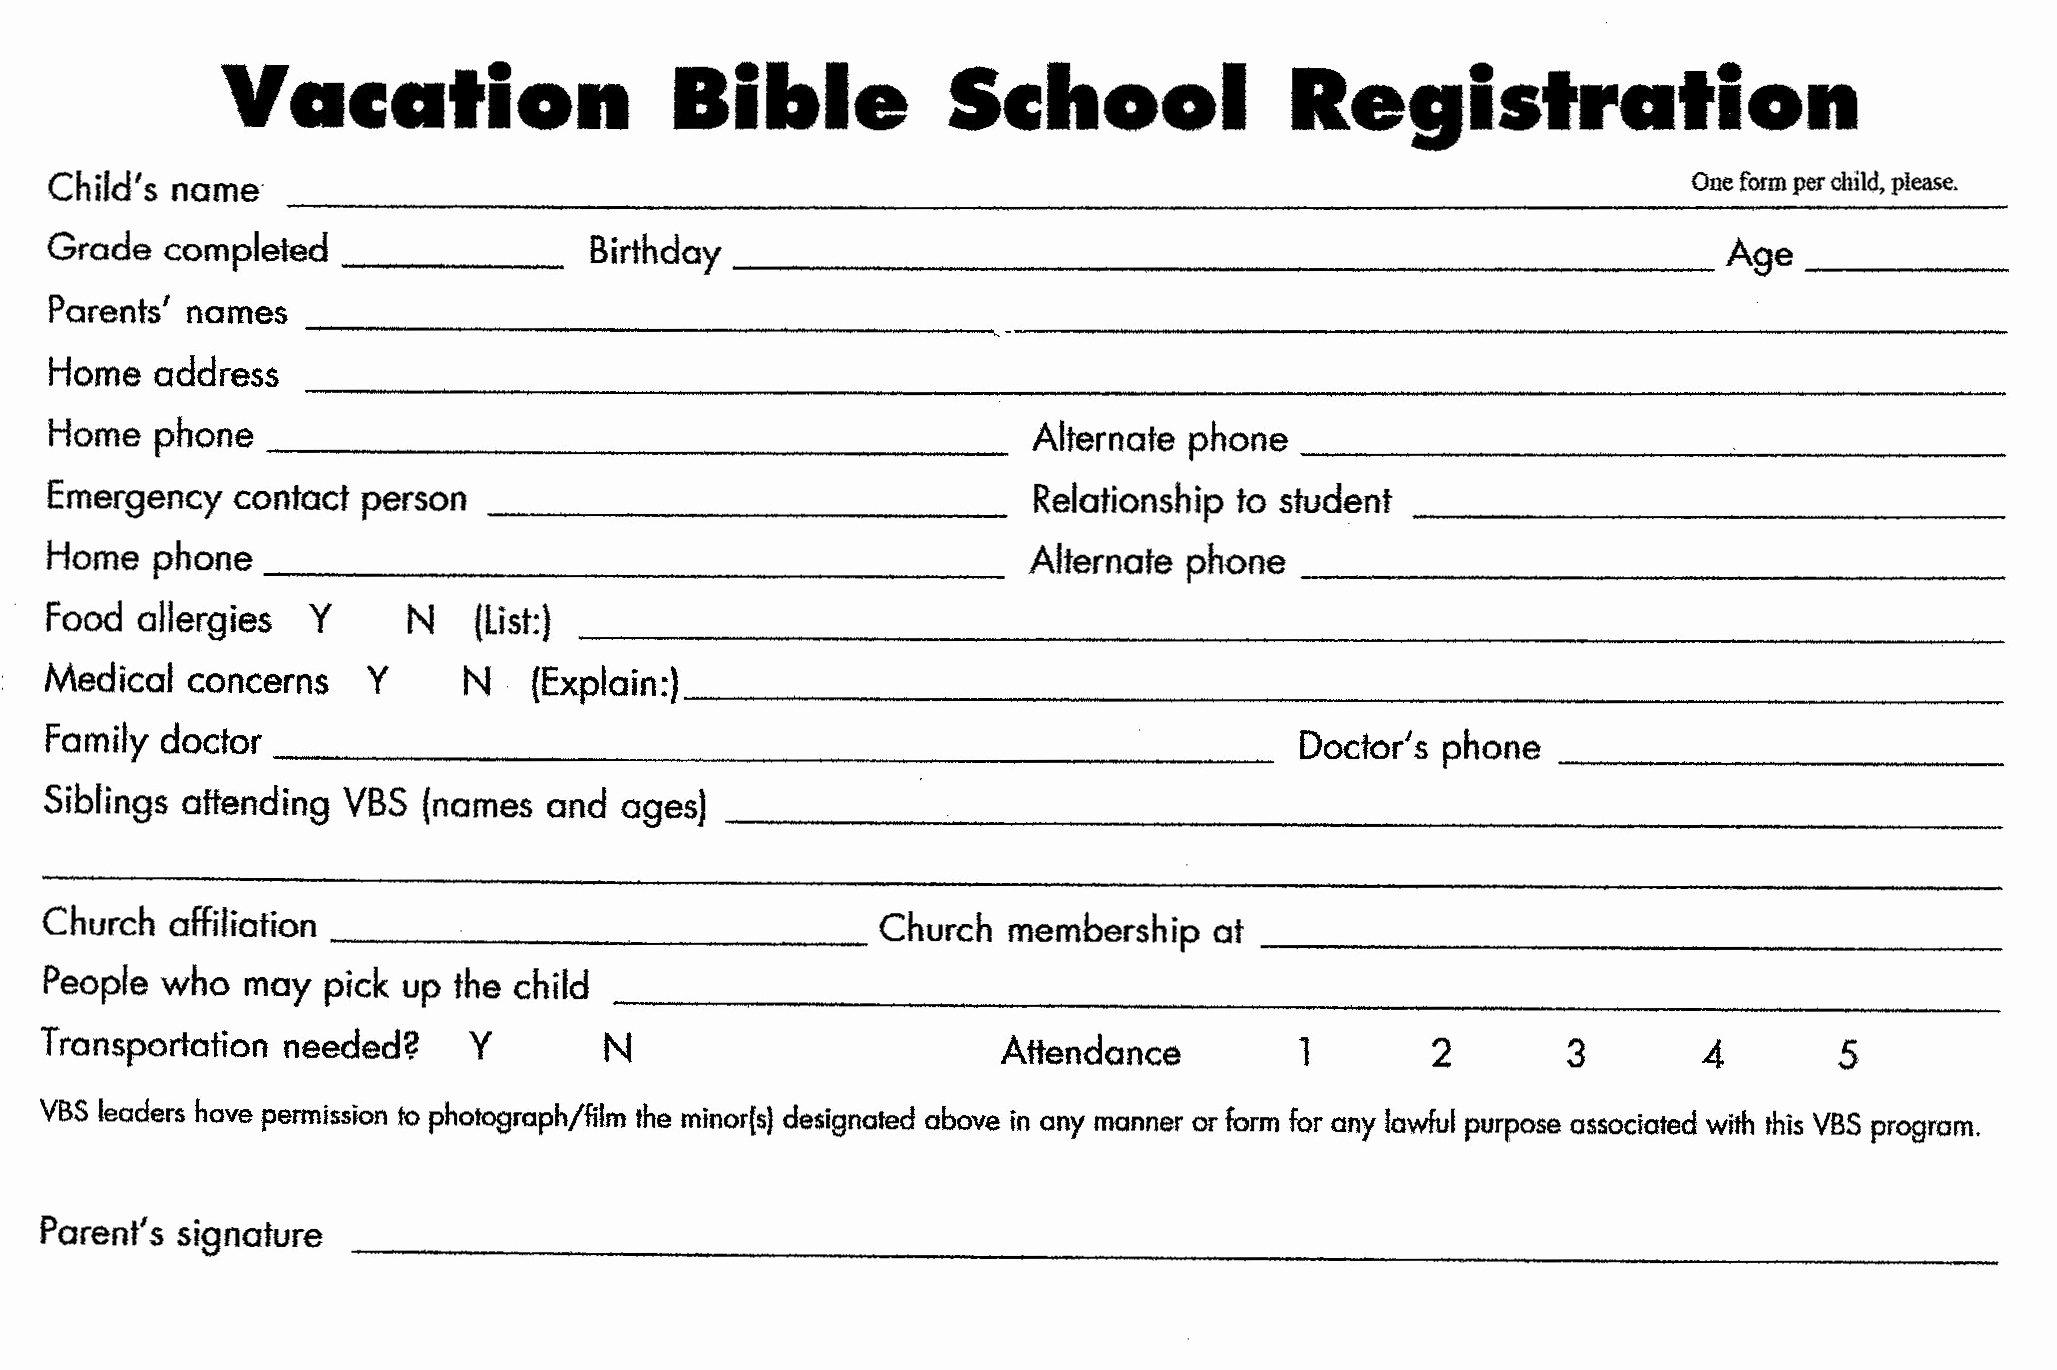 School Registration form Template Beautiful Index Of Cdn 24 1990 765